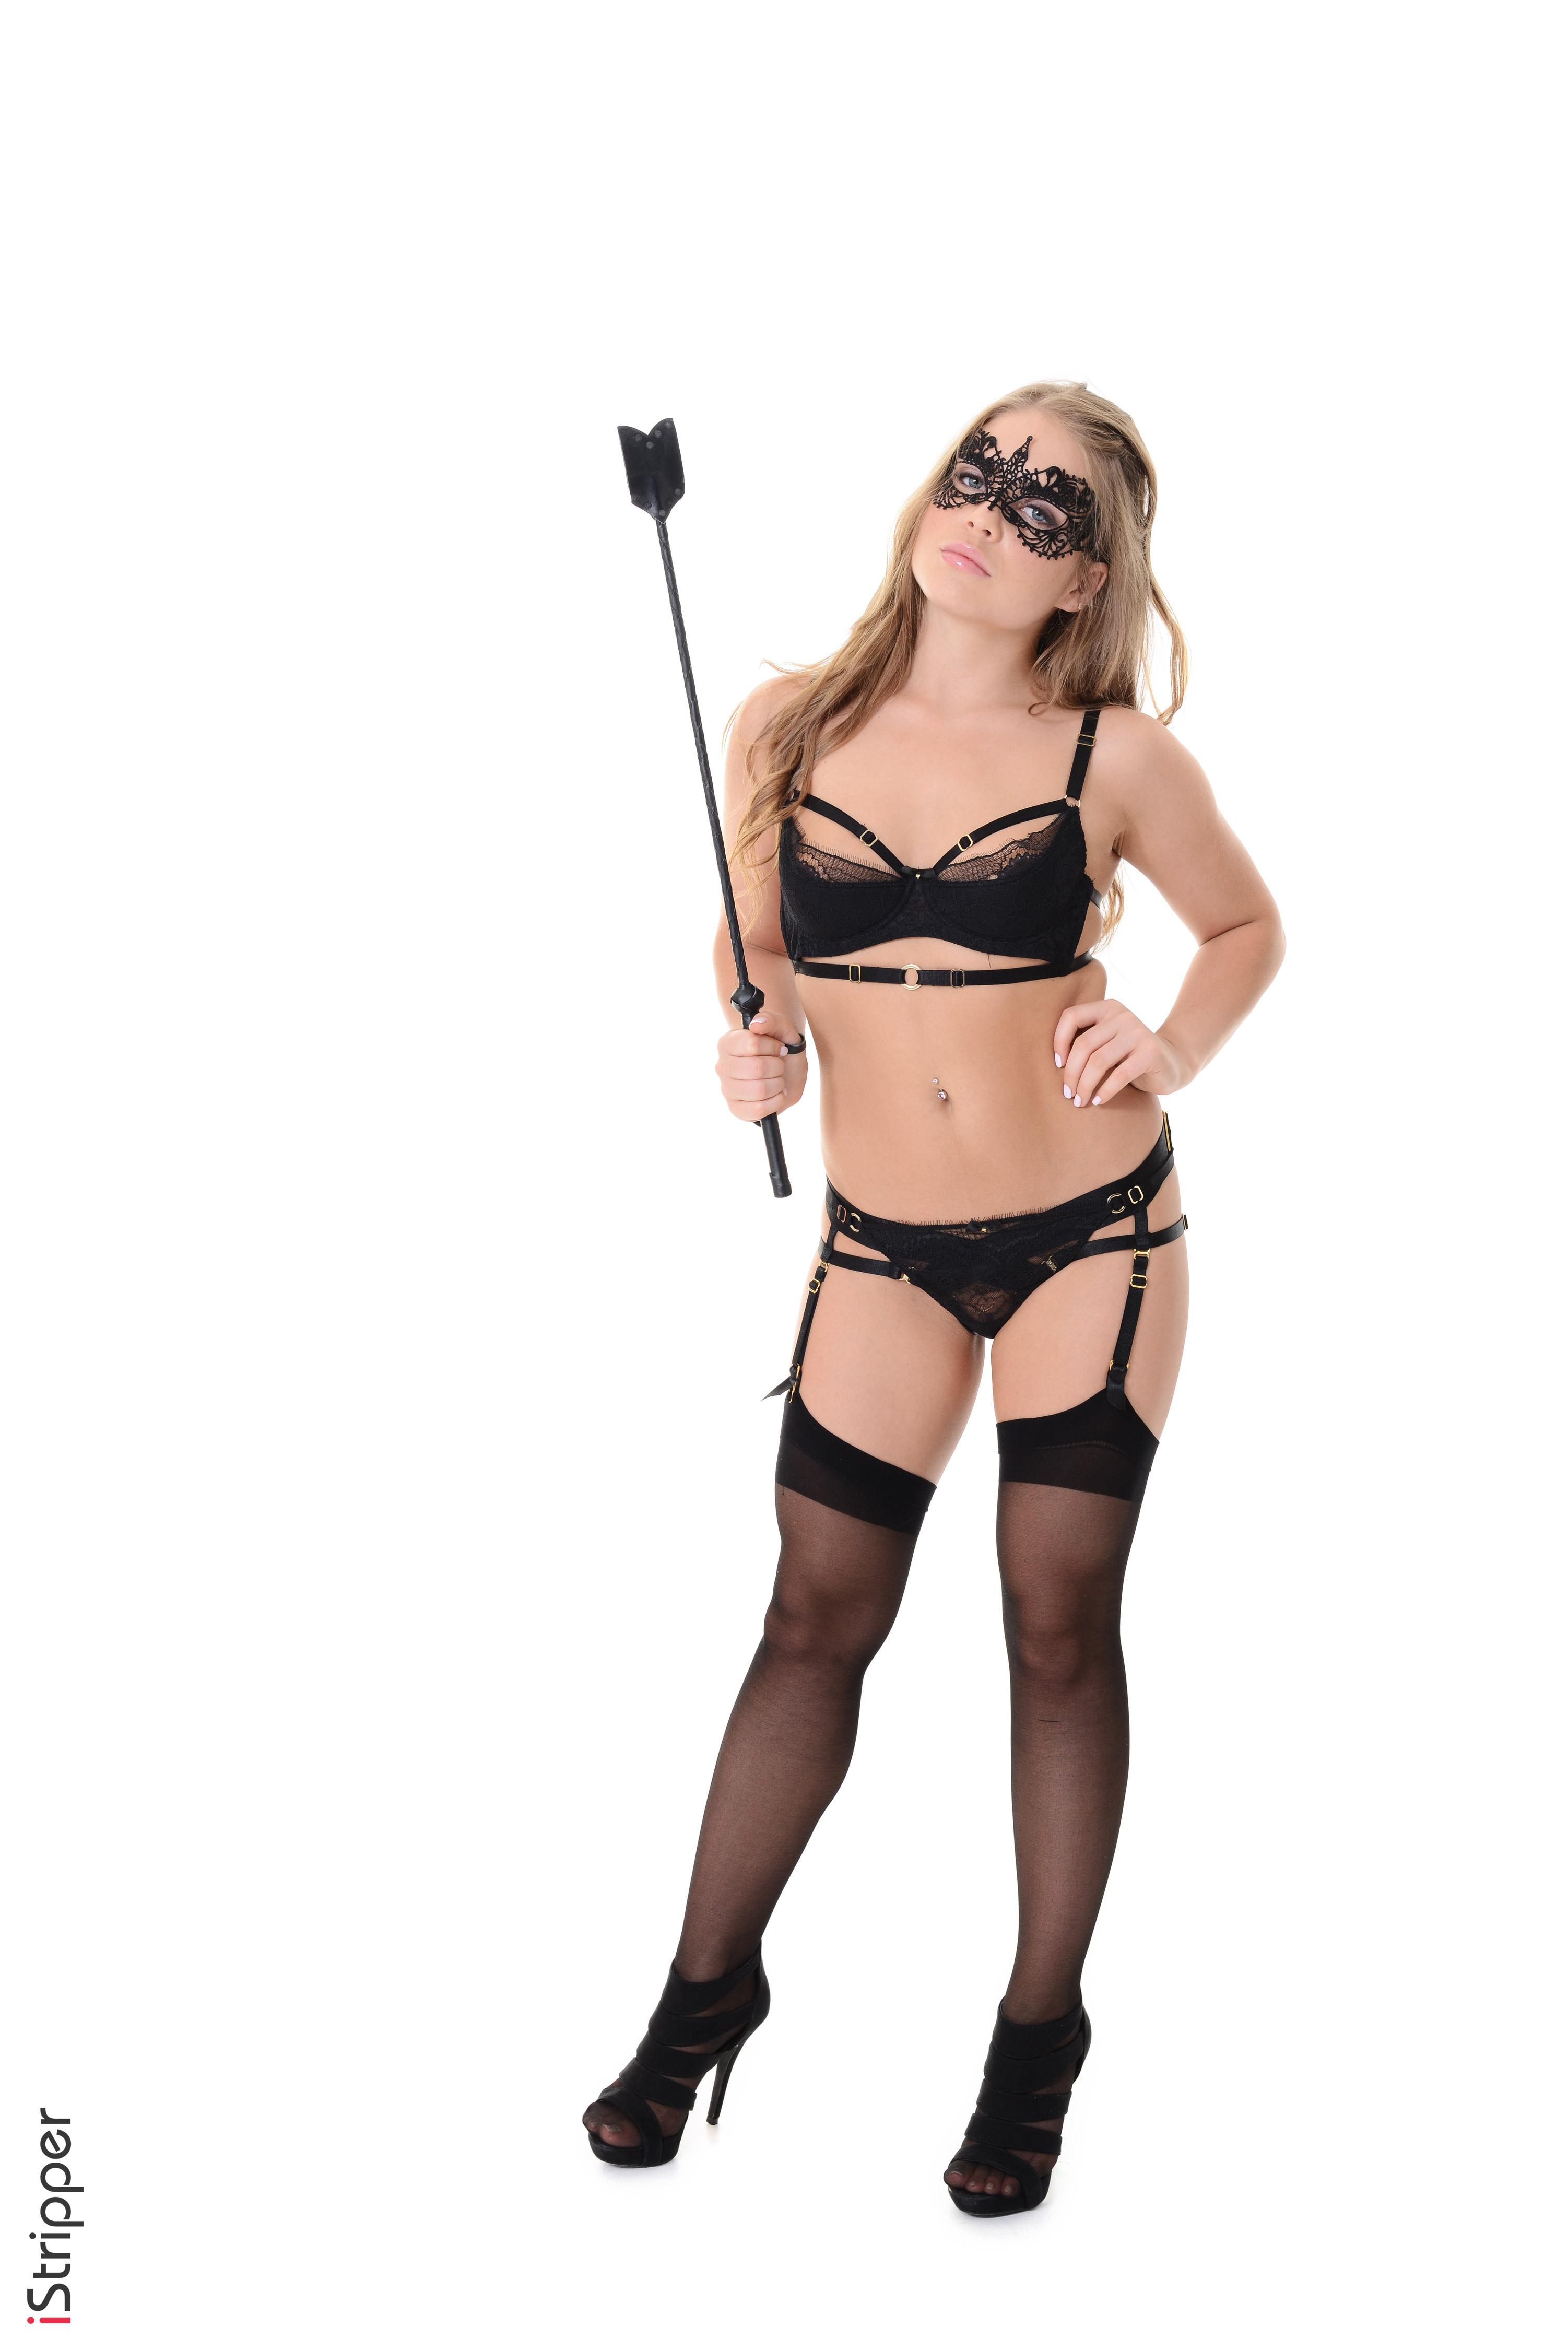 really hot girls stripping